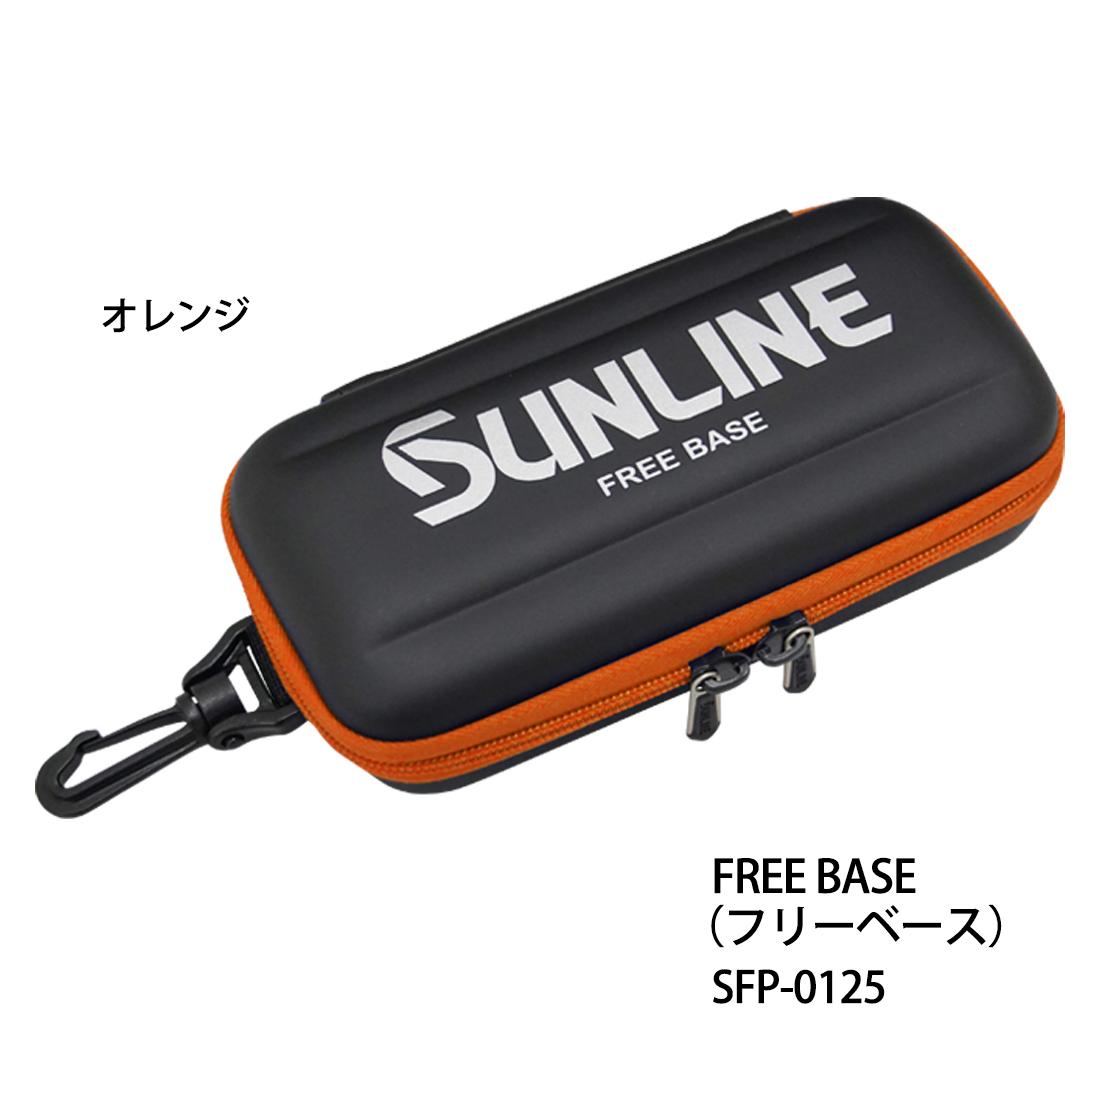 FREE BASE(フリーベース) SFP−0125